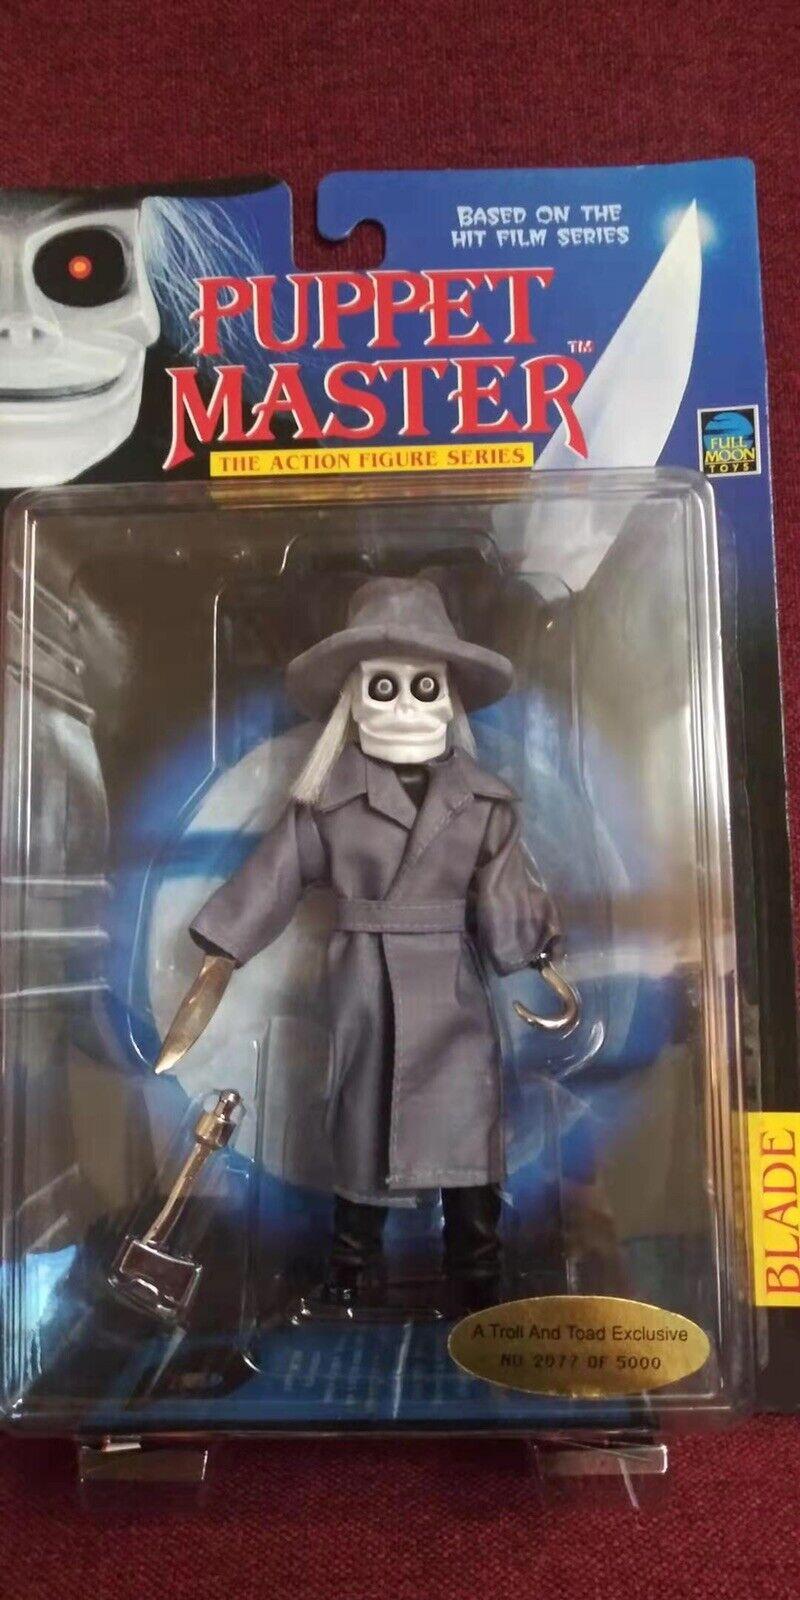 Moon Juguetes 1998 marioneta Master Full Toad y Troll exclusivo Hoja acción Fig jsh